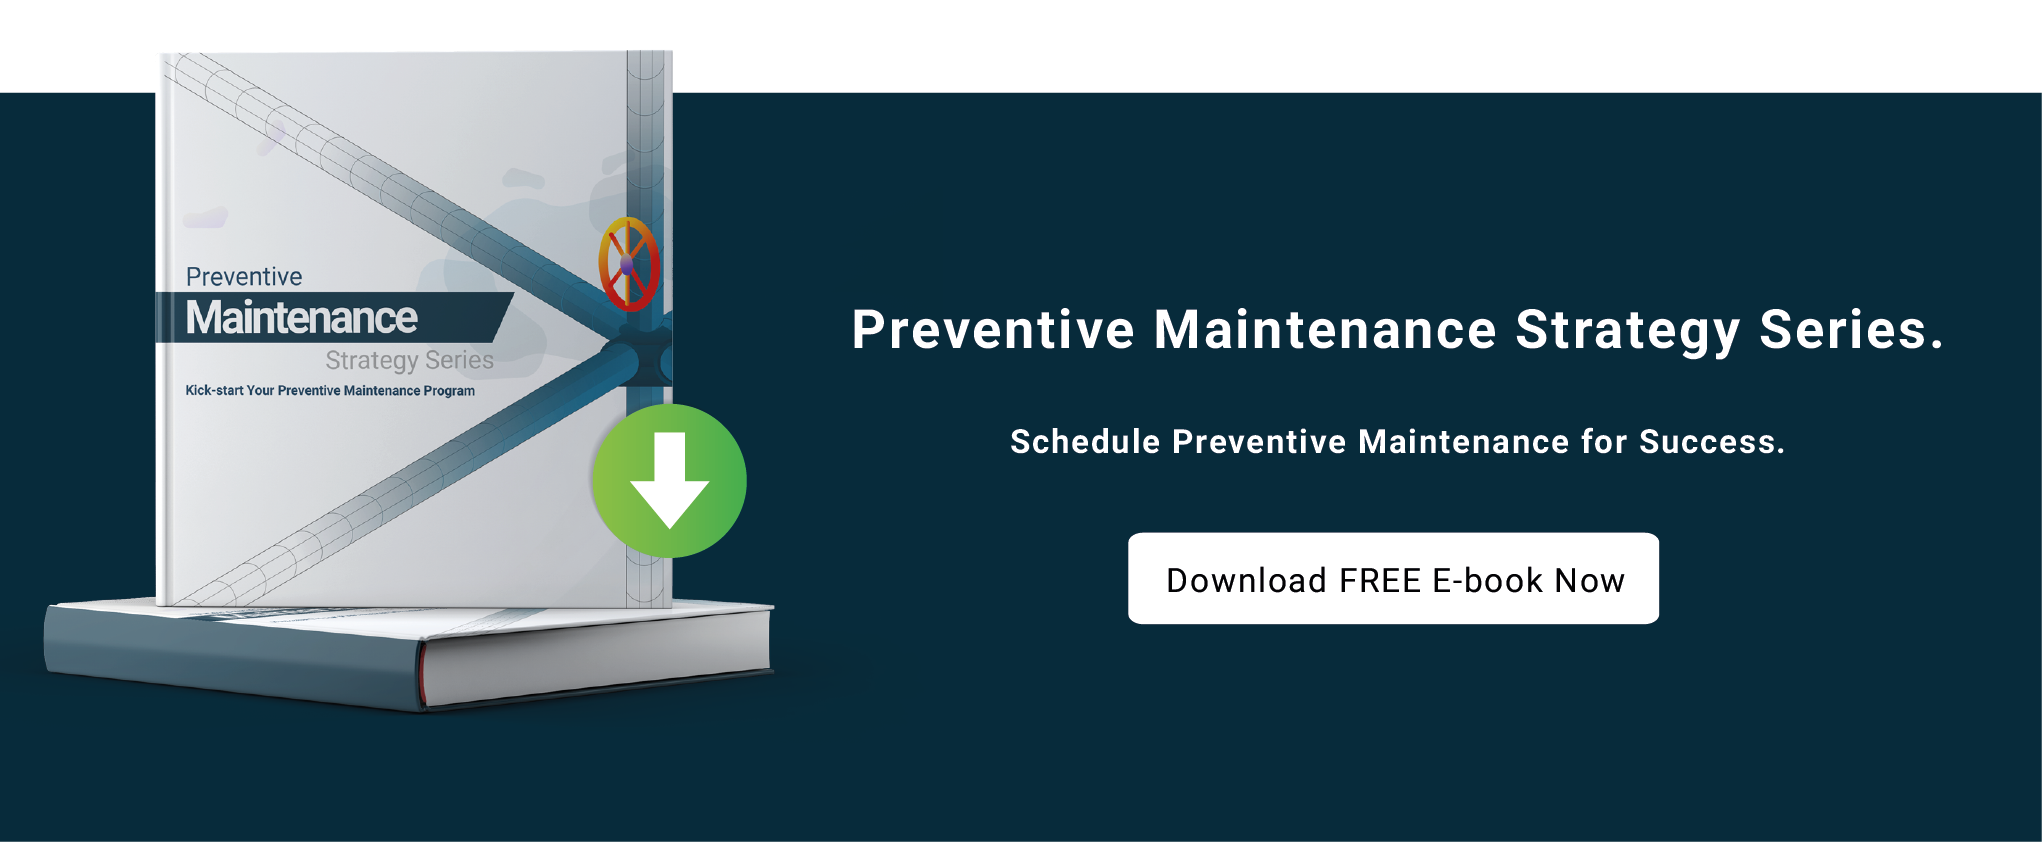 Preventive Maintenance Schedule E-book